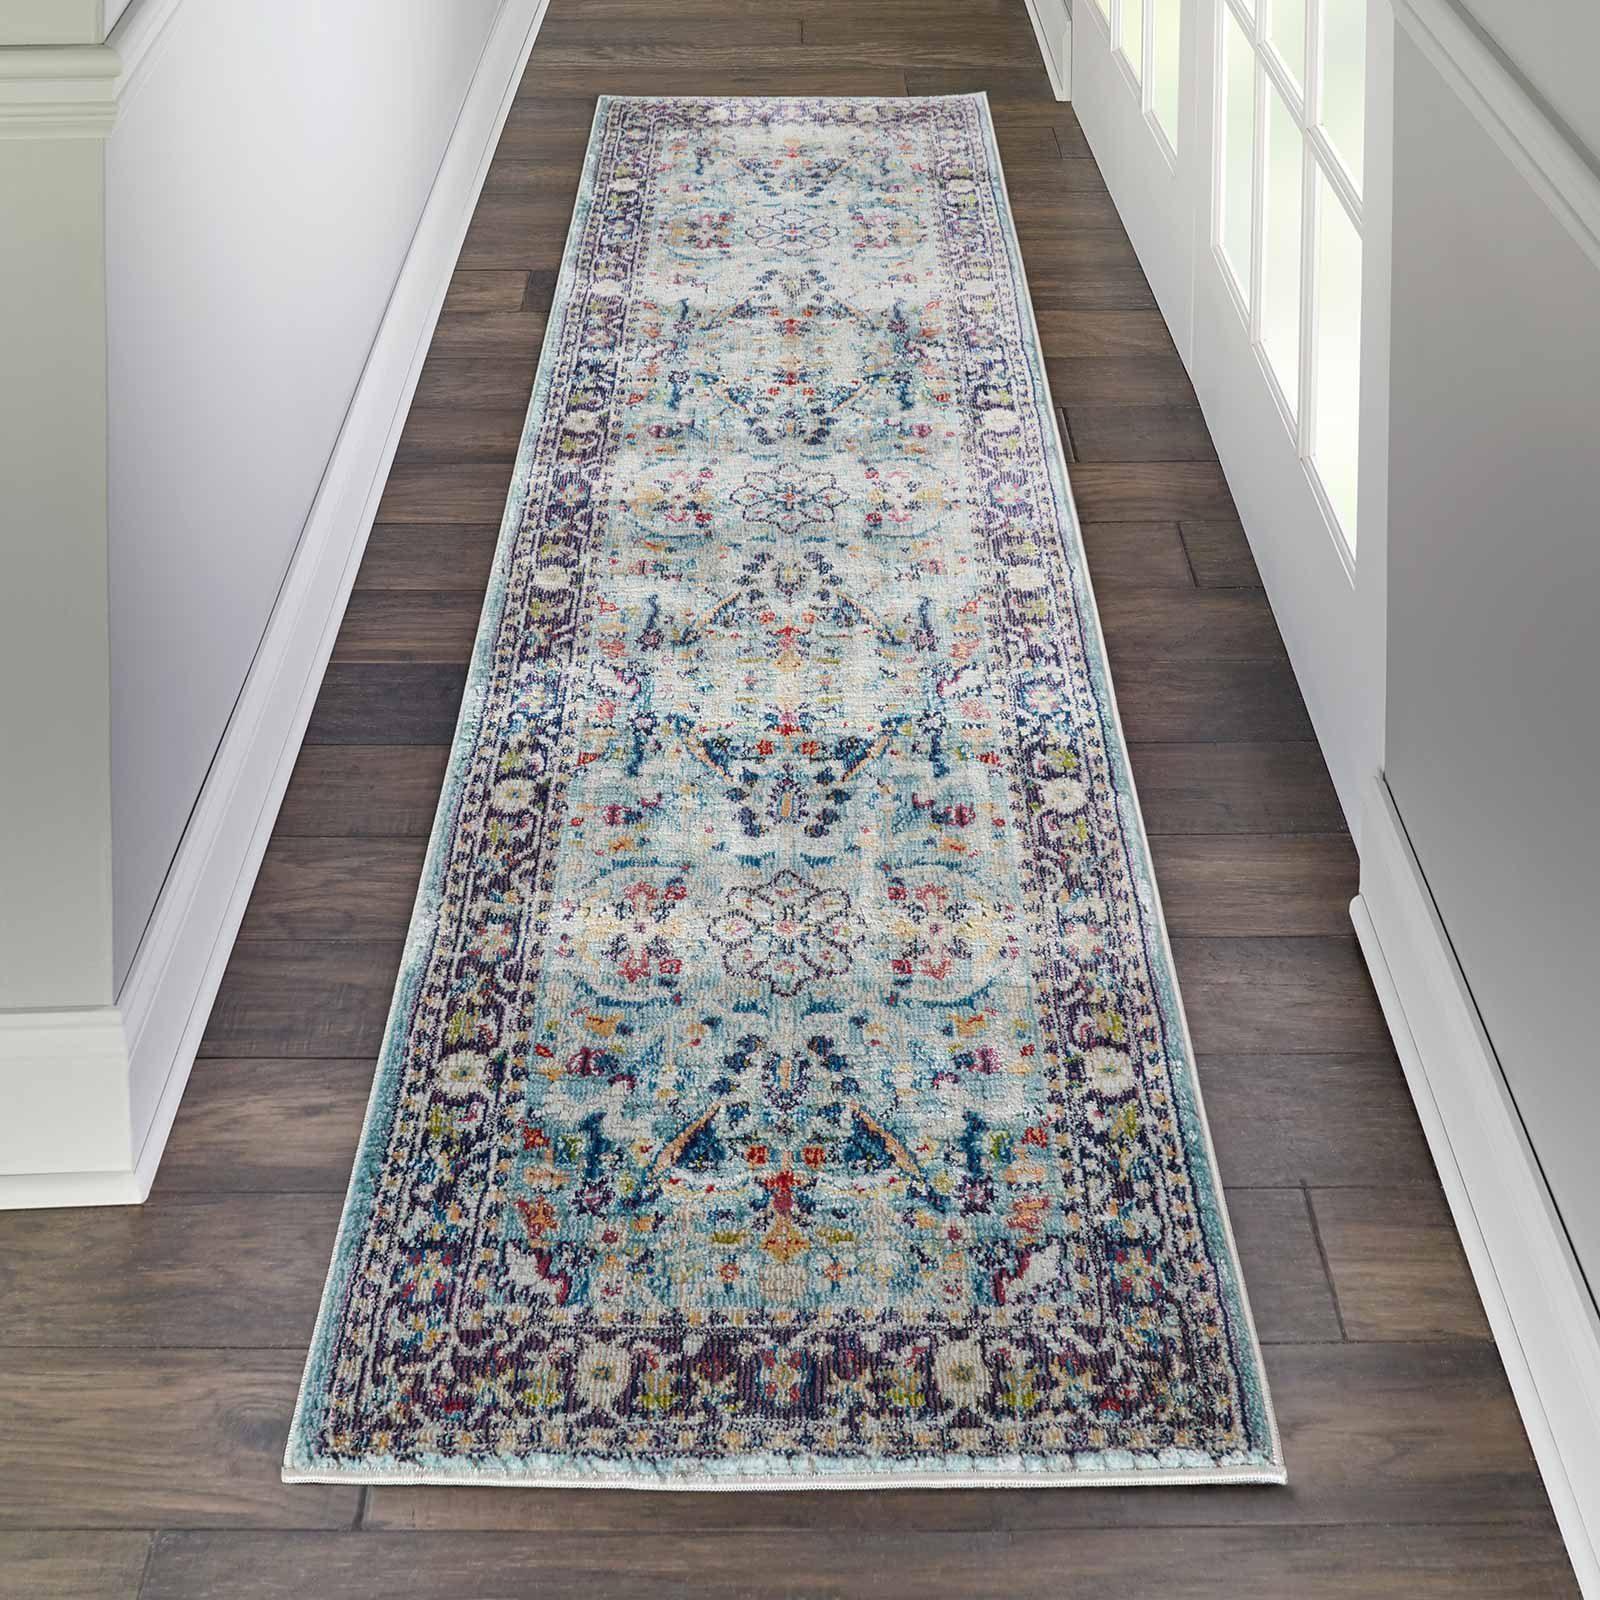 Nourison rug Ankara Global ANR14 TEAL MULTI 2x6 099446498403 interior 1 C